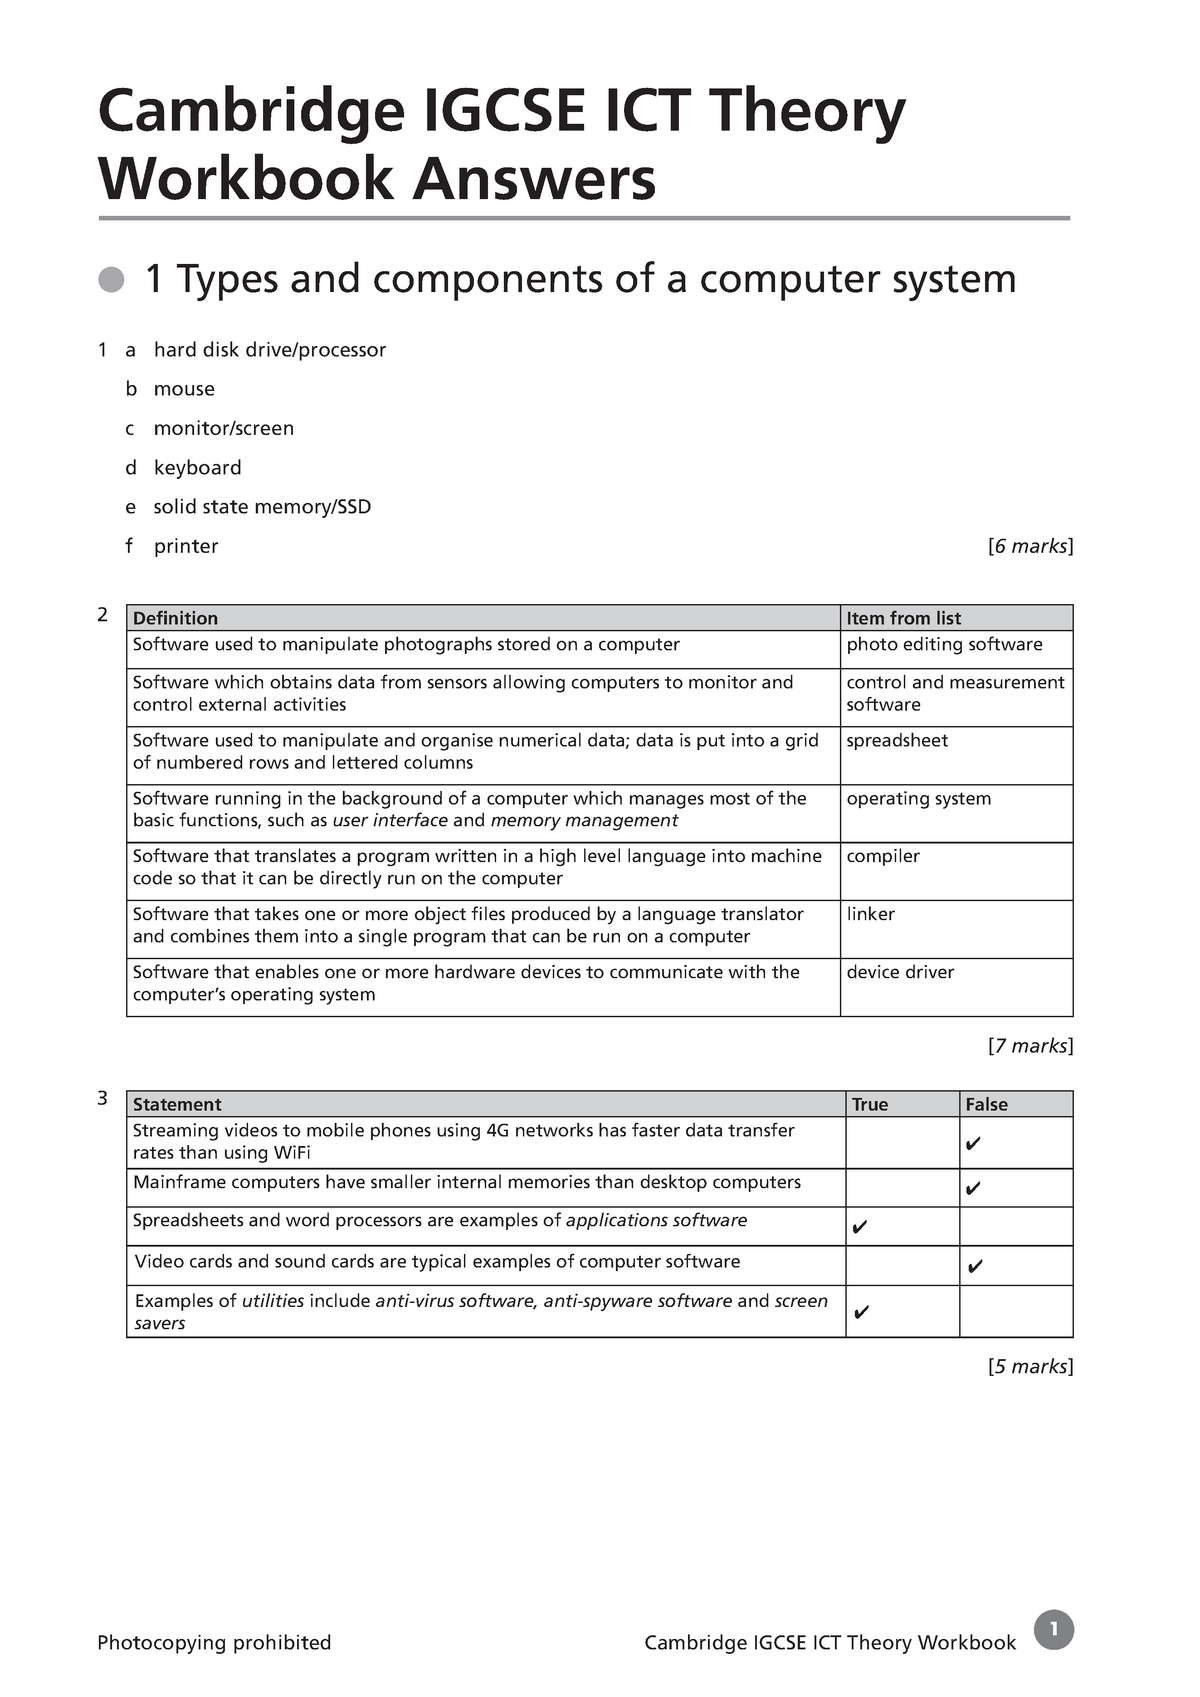 890369 Answer Igcse ICT Theory WB - CDES 389 - CSU Chico